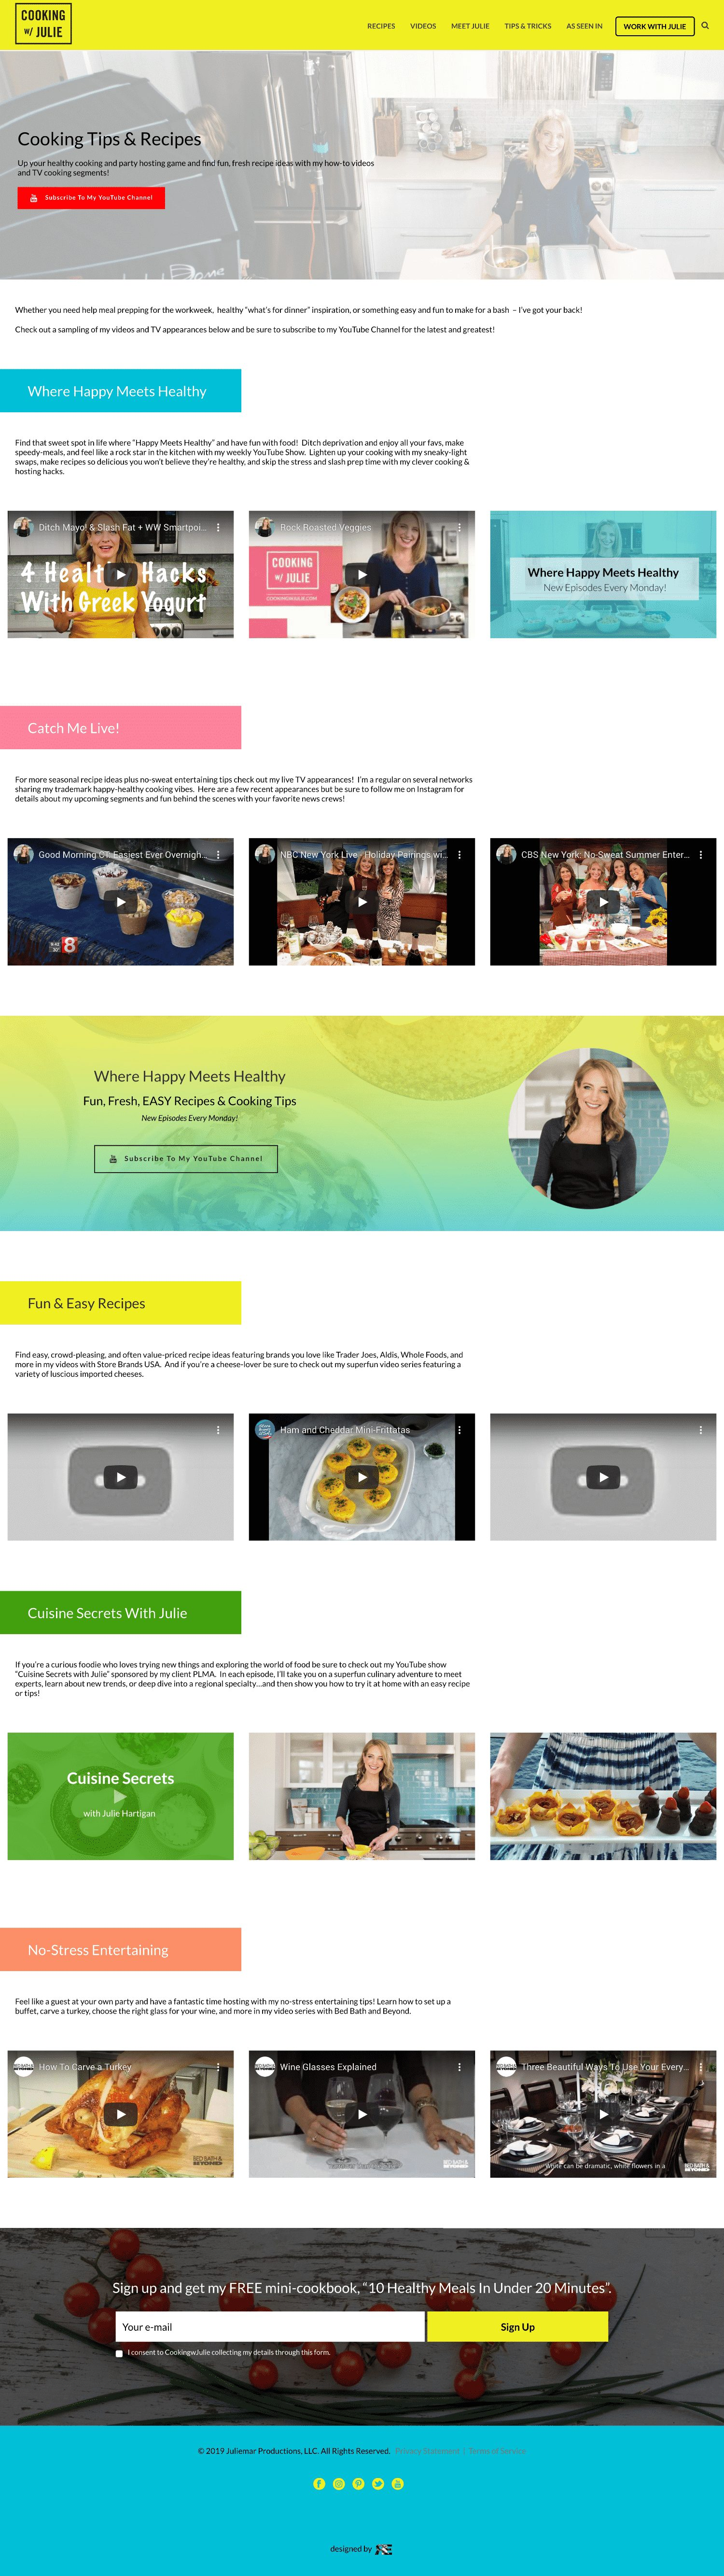 cwj-videos-full-dt-final